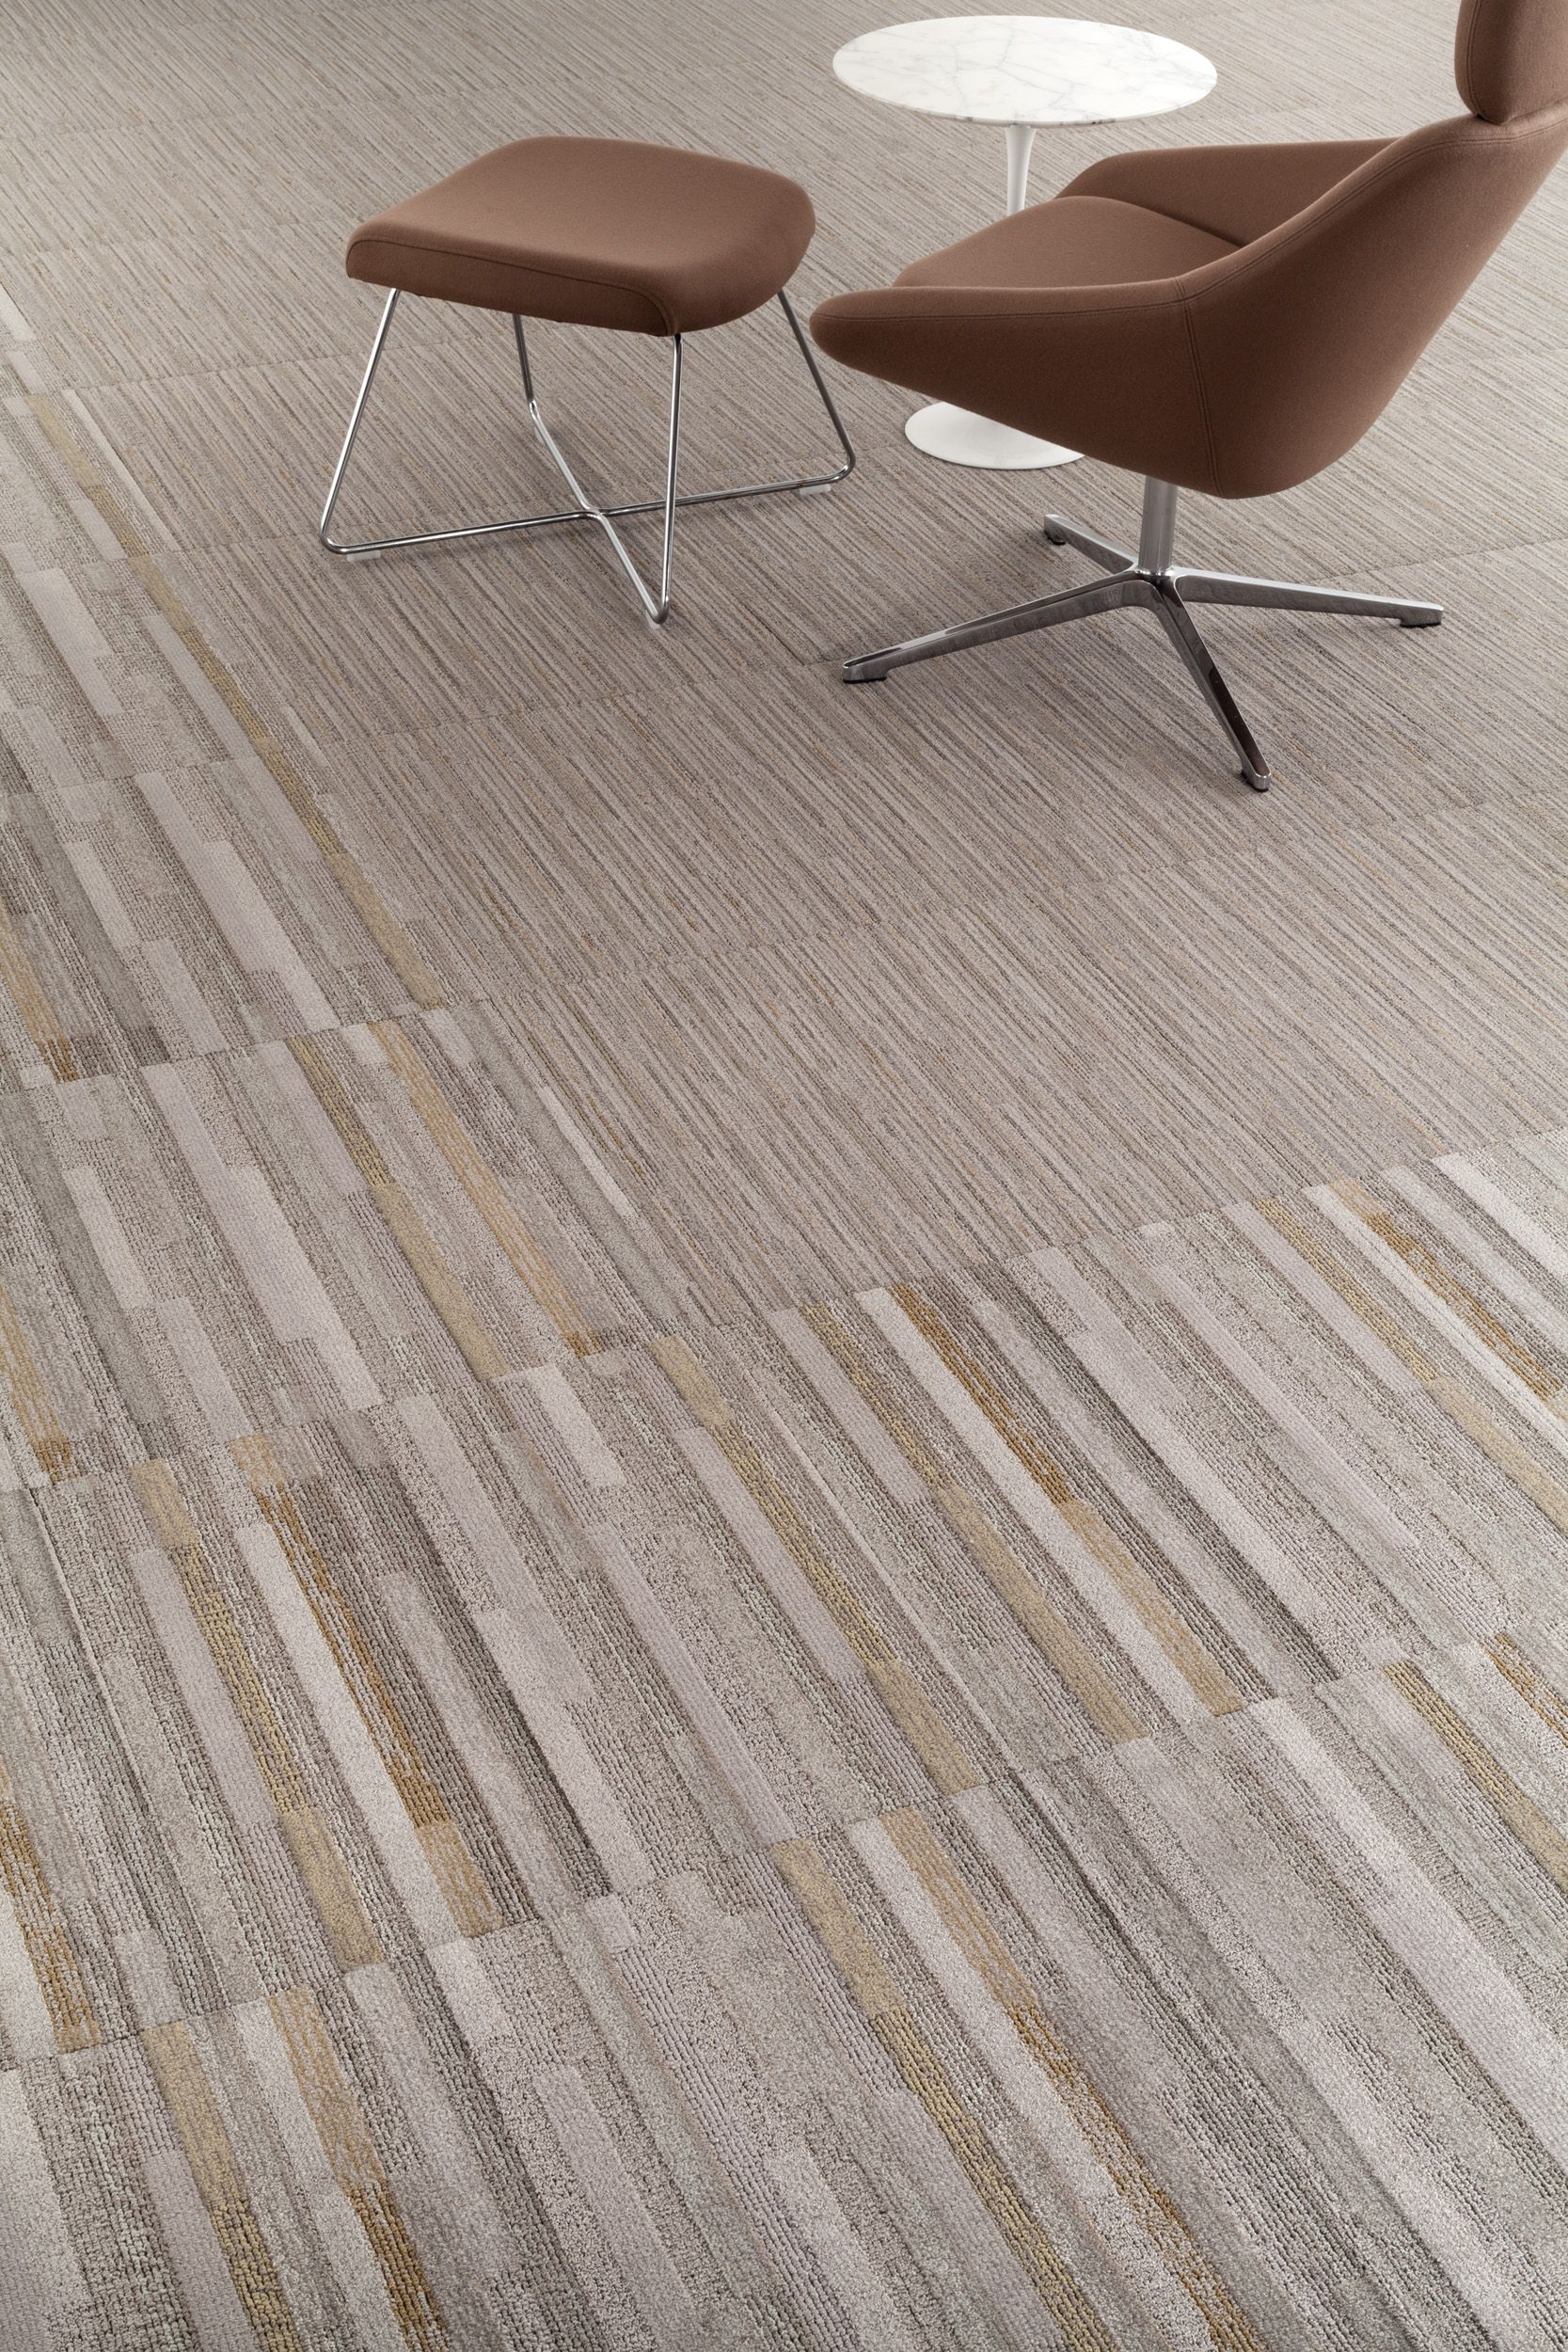 Milliken Nexus And Metro Modular Carpet Decor Interior Design